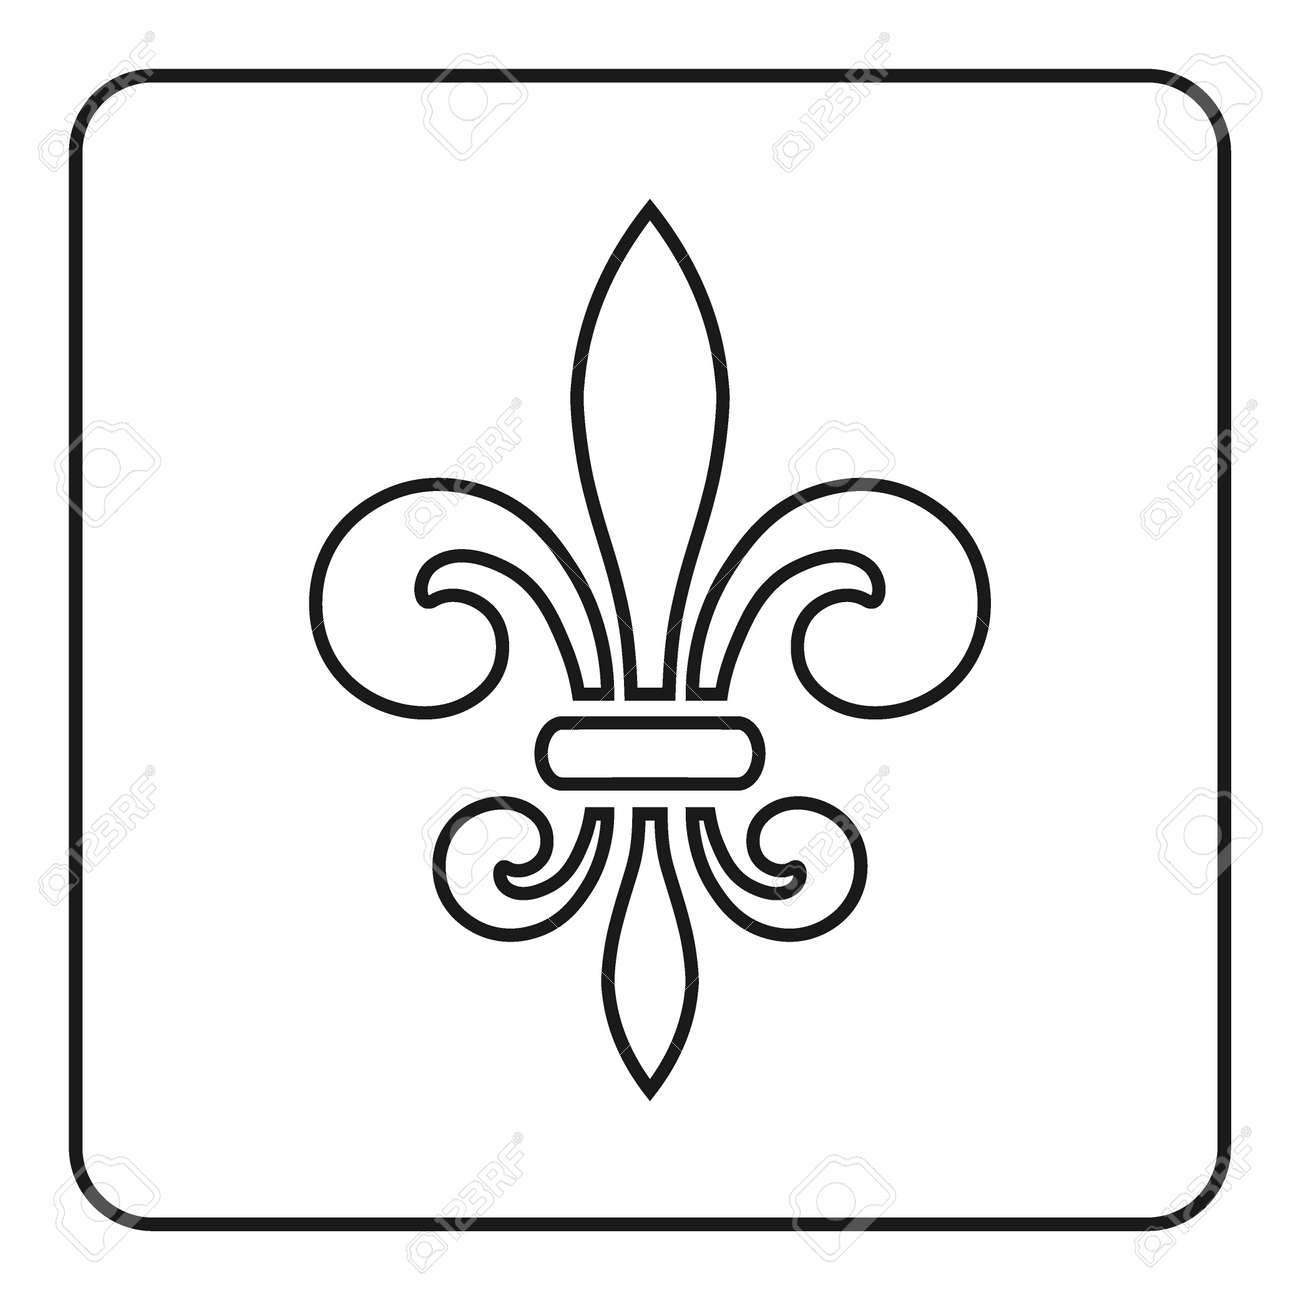 Fleur de lis symbol fleur de lis sign royal french lily fleur de lis symbol fleur de lis sign royal french lily biocorpaavc Gallery